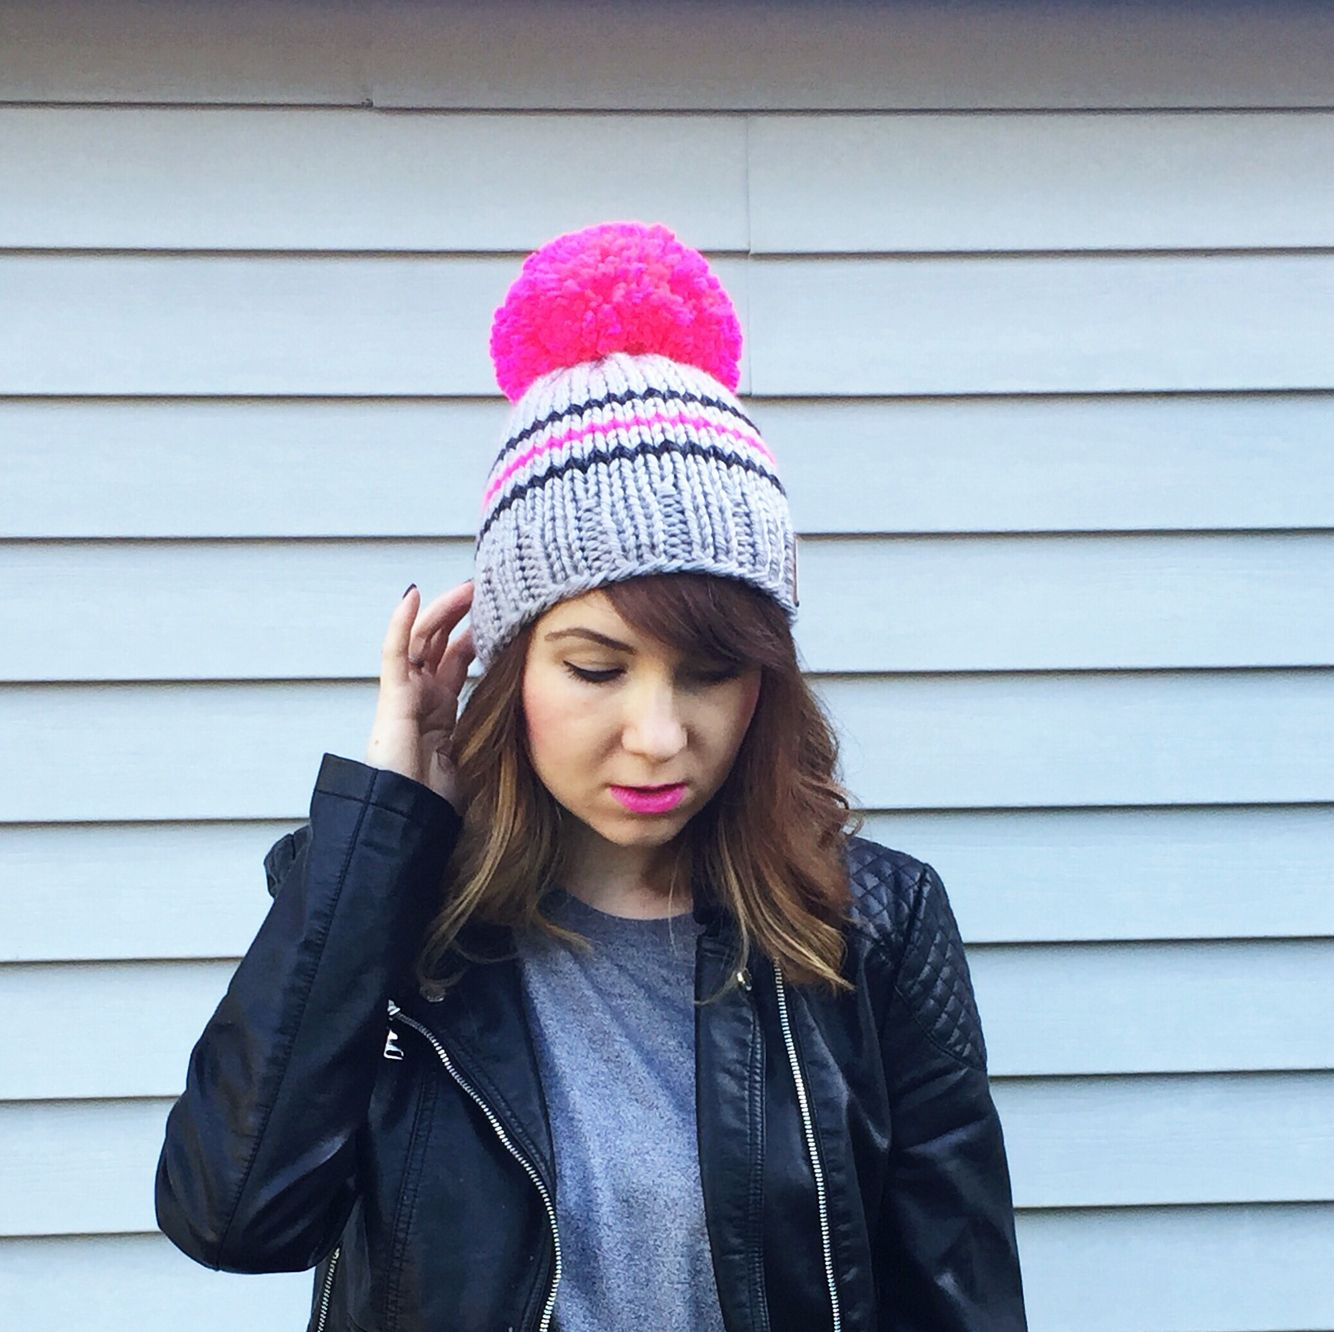 Hot pink winter hat a7a8190755f